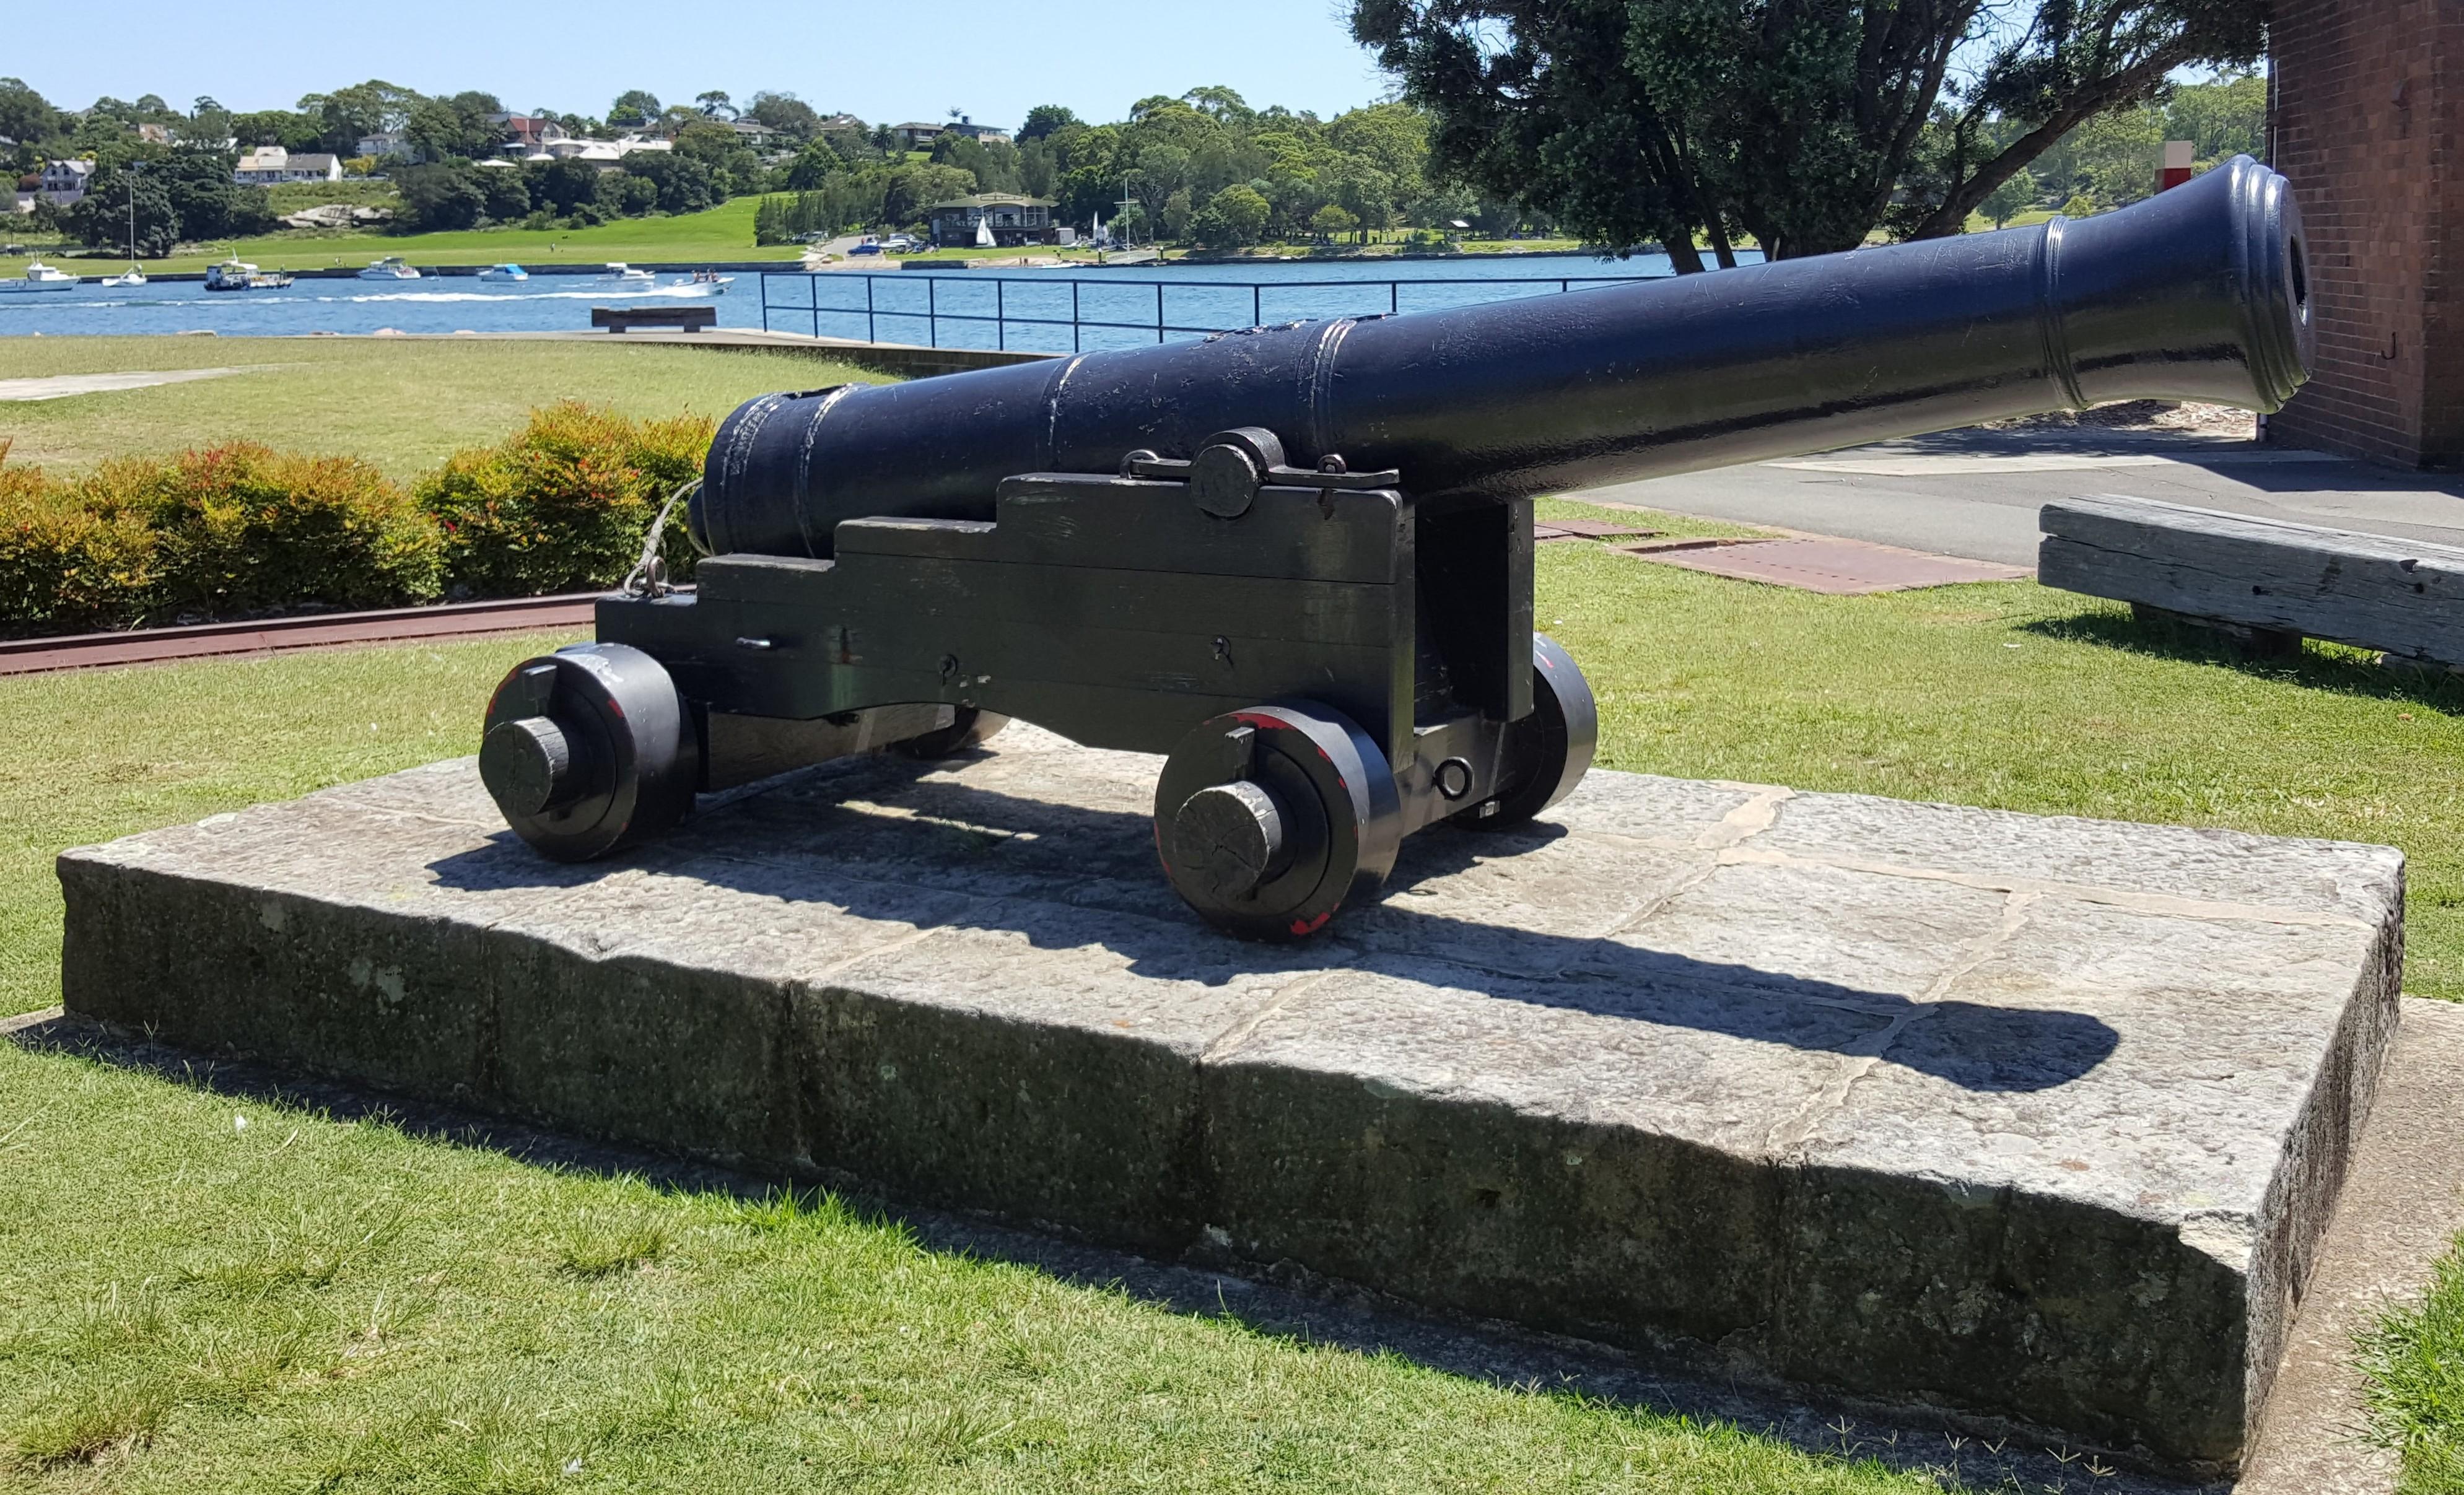 Explore Cockatoo Island